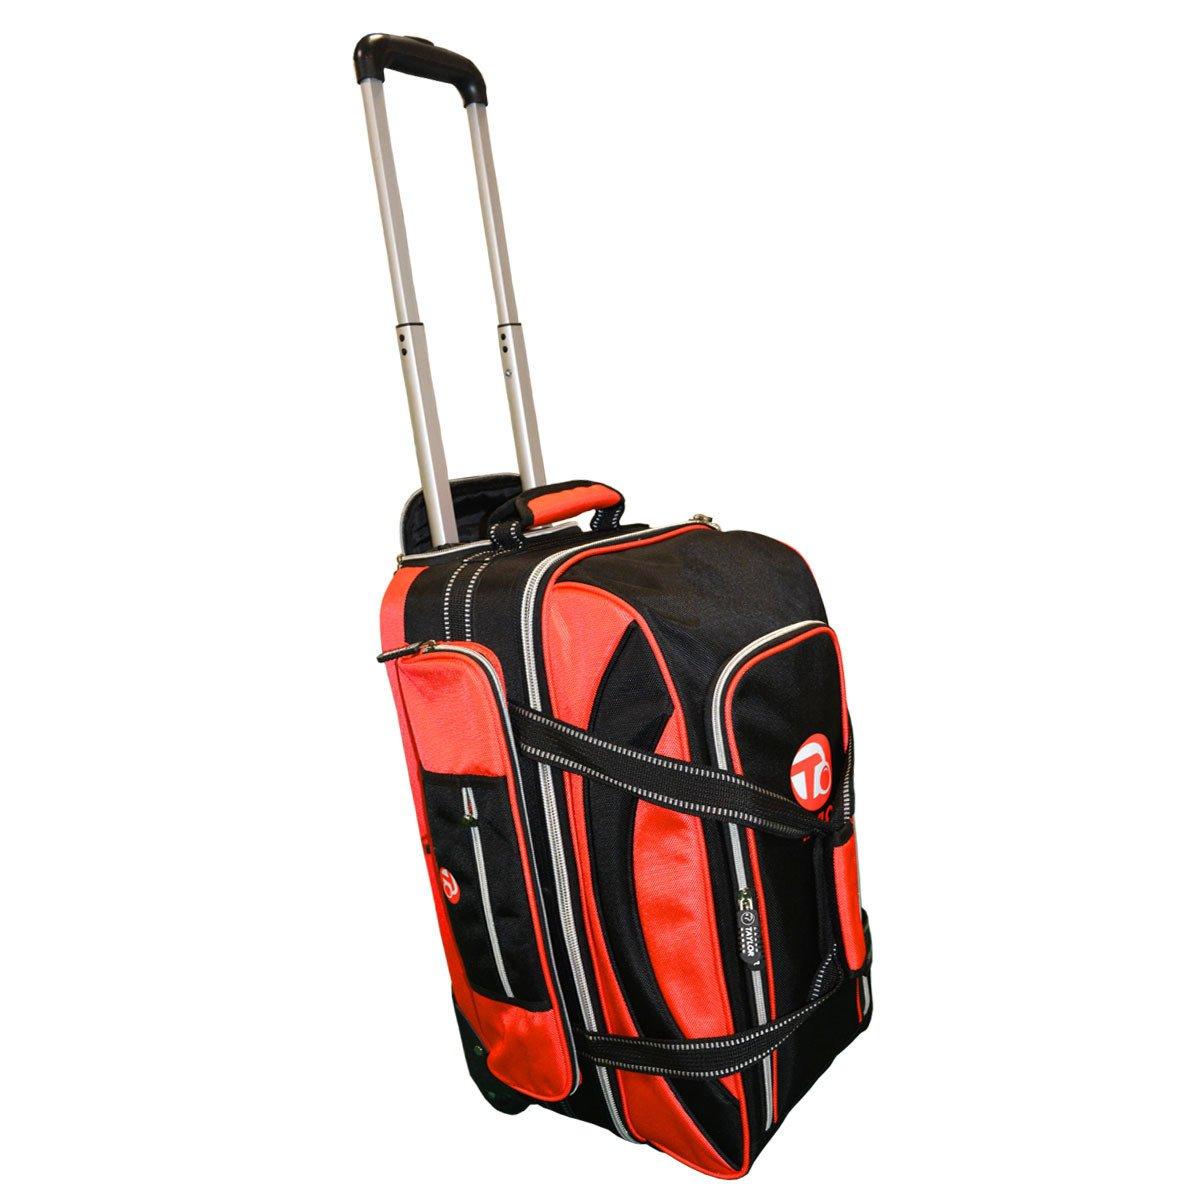 Taylor Bowls Ultimate Wheel Trolley Bag